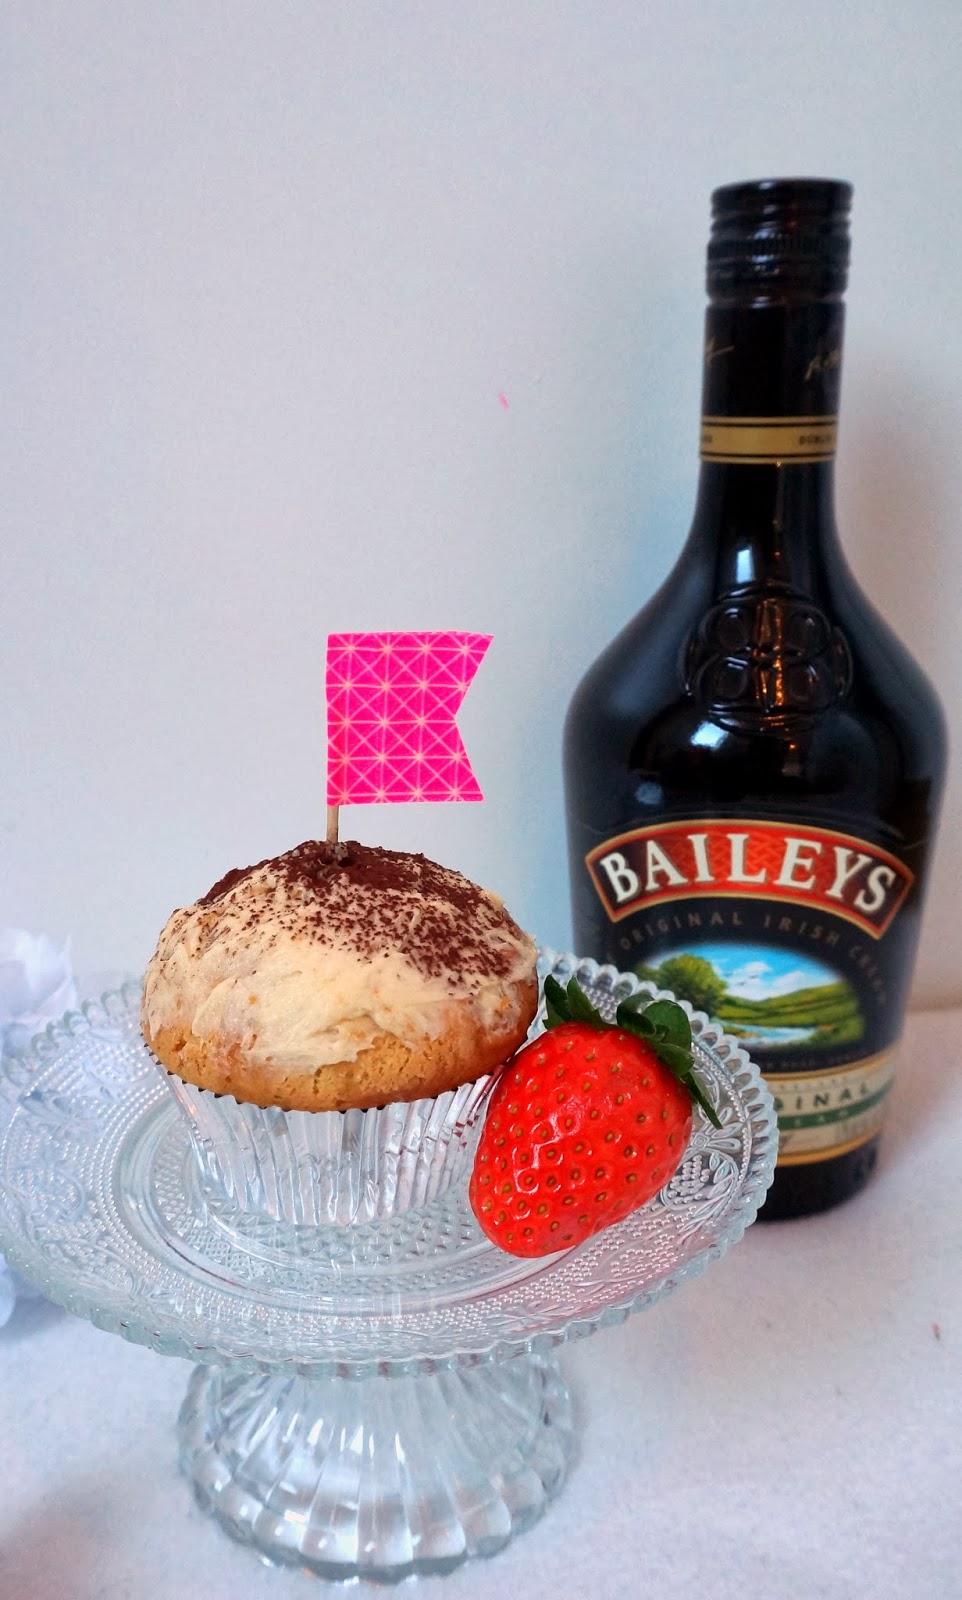 Baileys du de leche trés leche Cupcakes Alkohol Erdbeere Geburtstag Milch